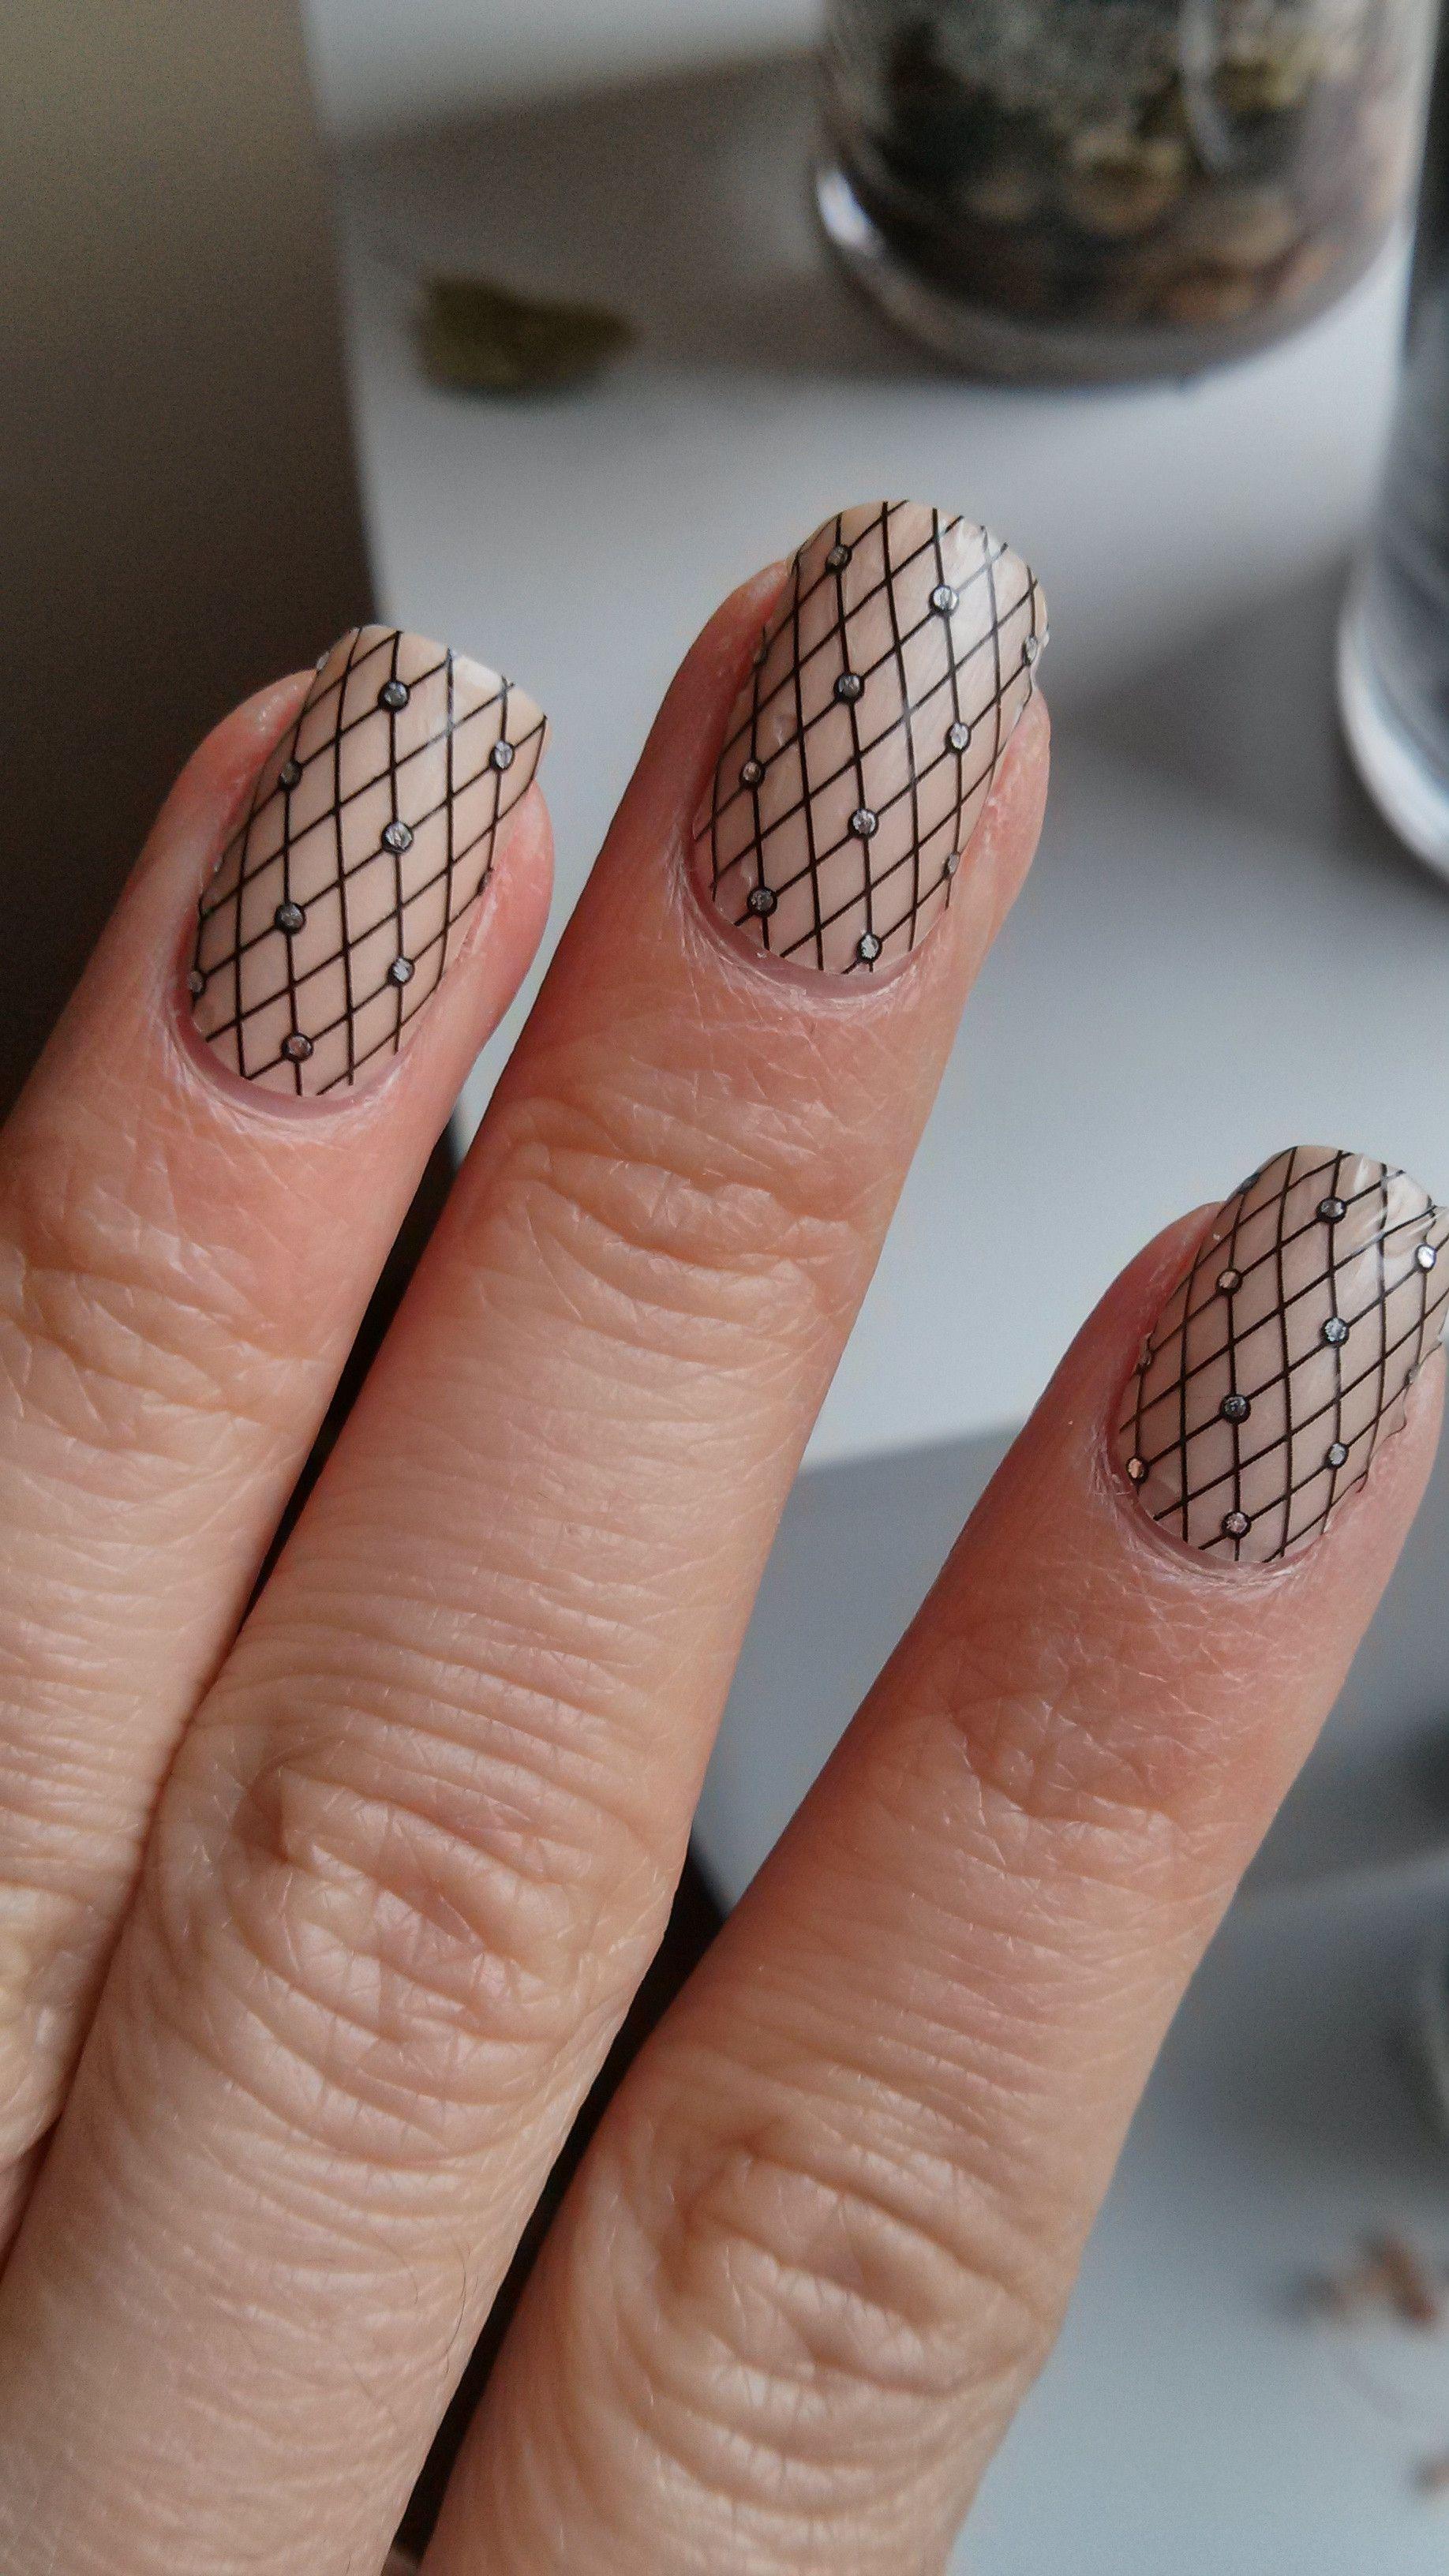 Um7lh9t.jpg (1836×3264) | Nails | Pinterest | Art nails and Manicure